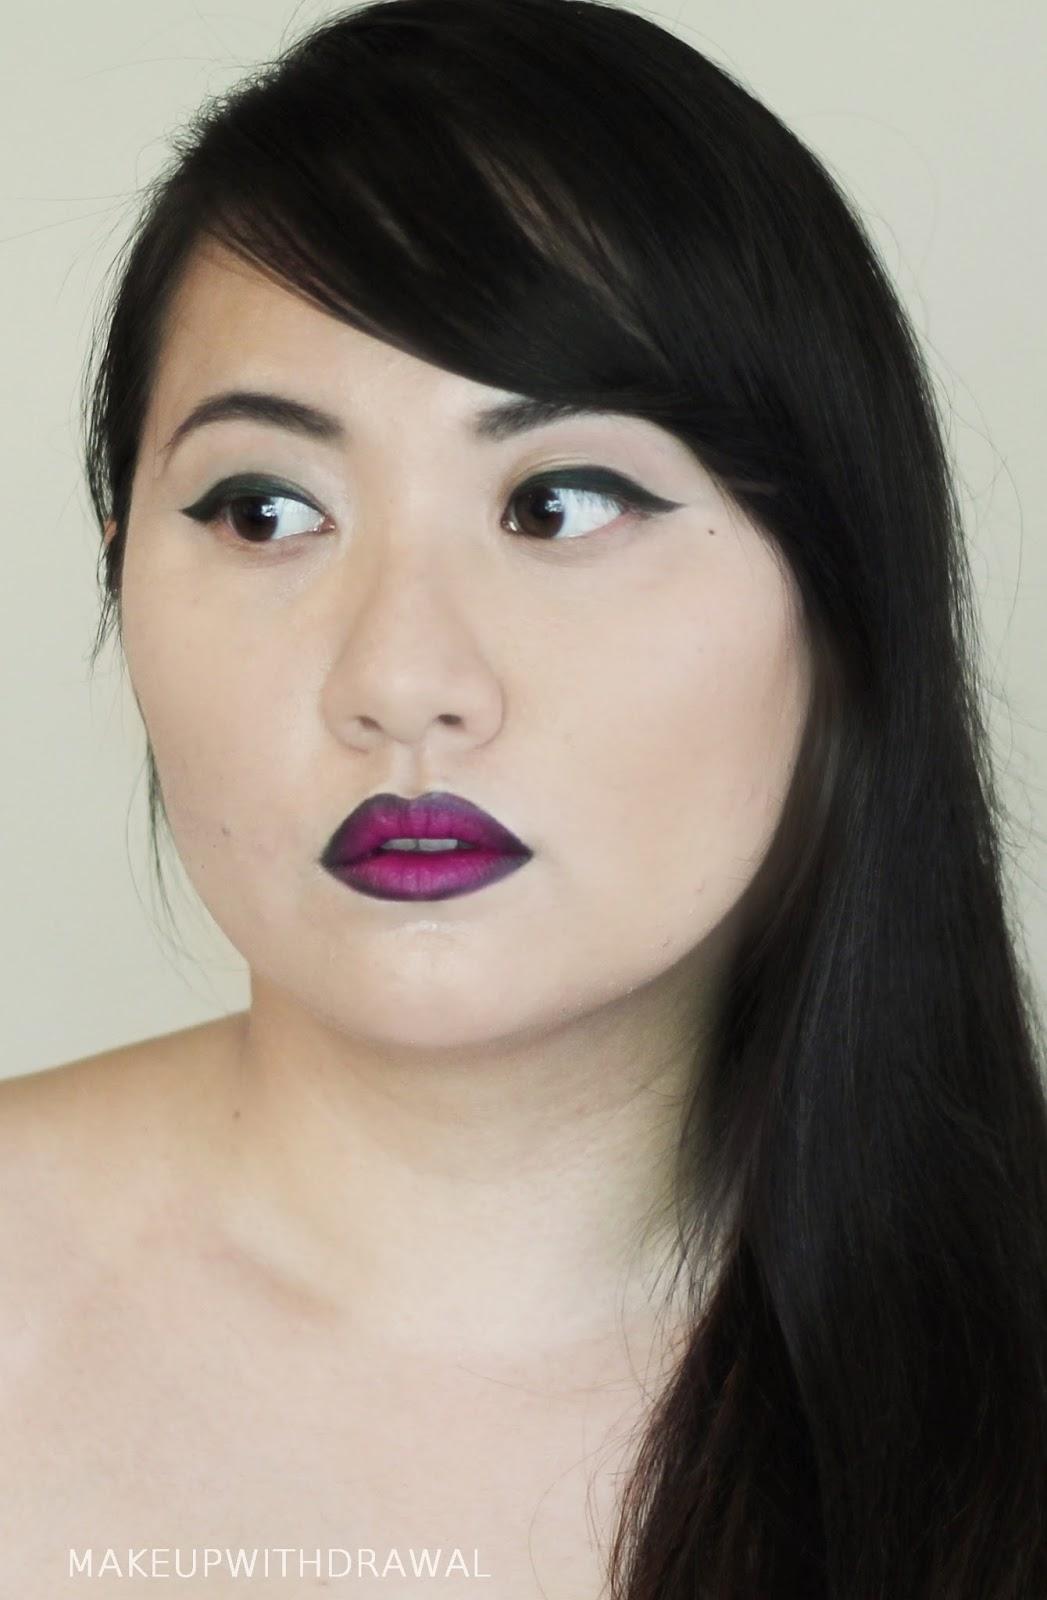 FOTD with Impulse Cosmetics Run Away Lipstick   Makeup Withdrawal